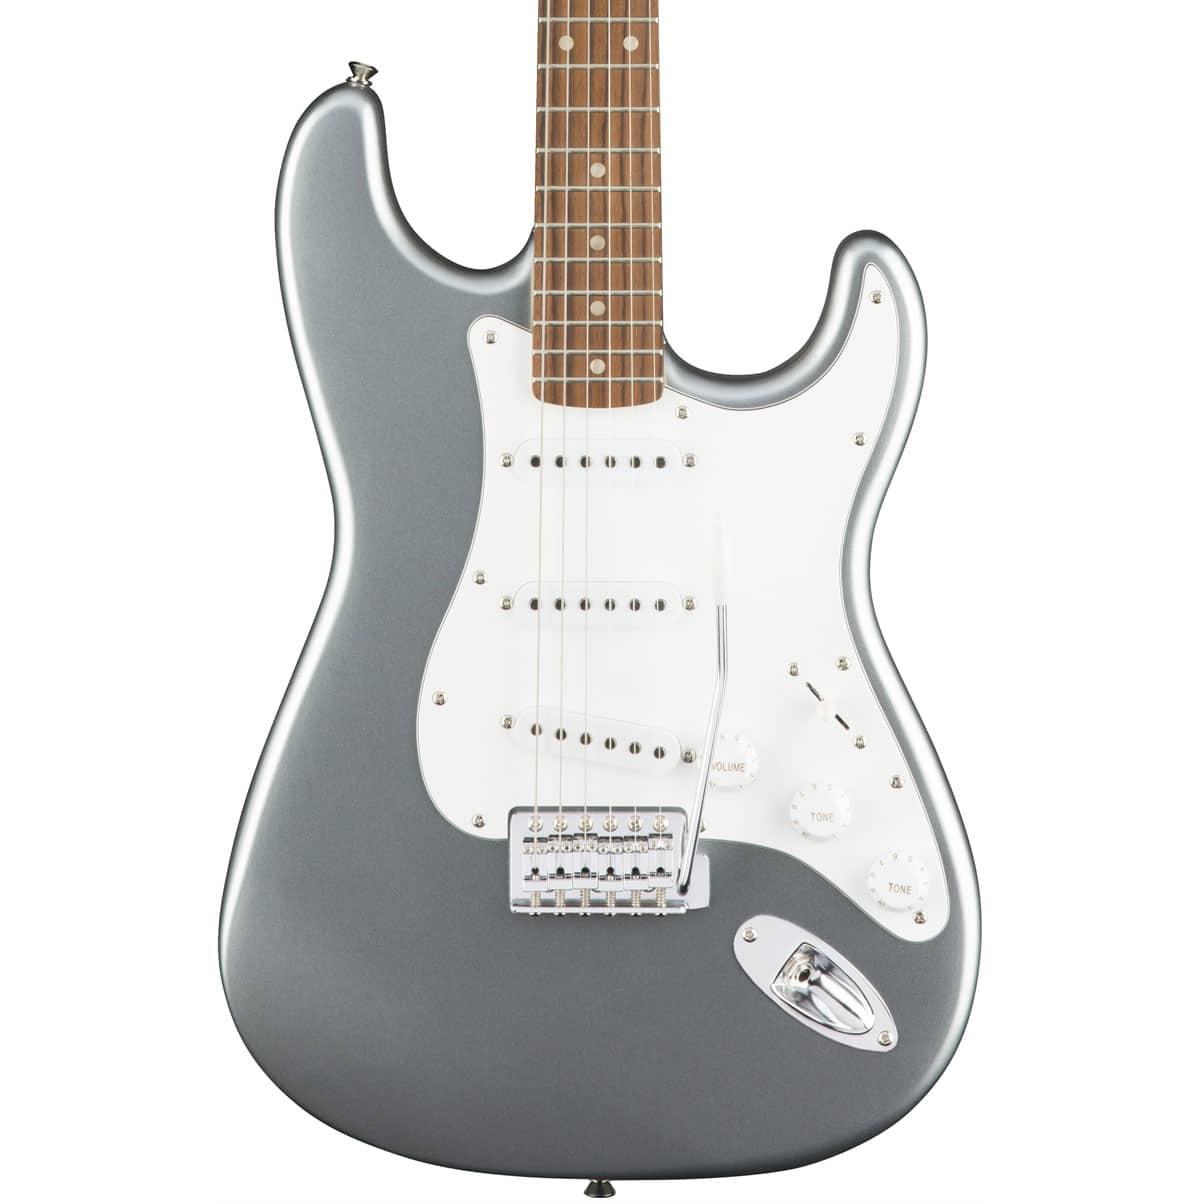 Squier Affinity Stratocaster - Laurel Fretboard - Slick Silver